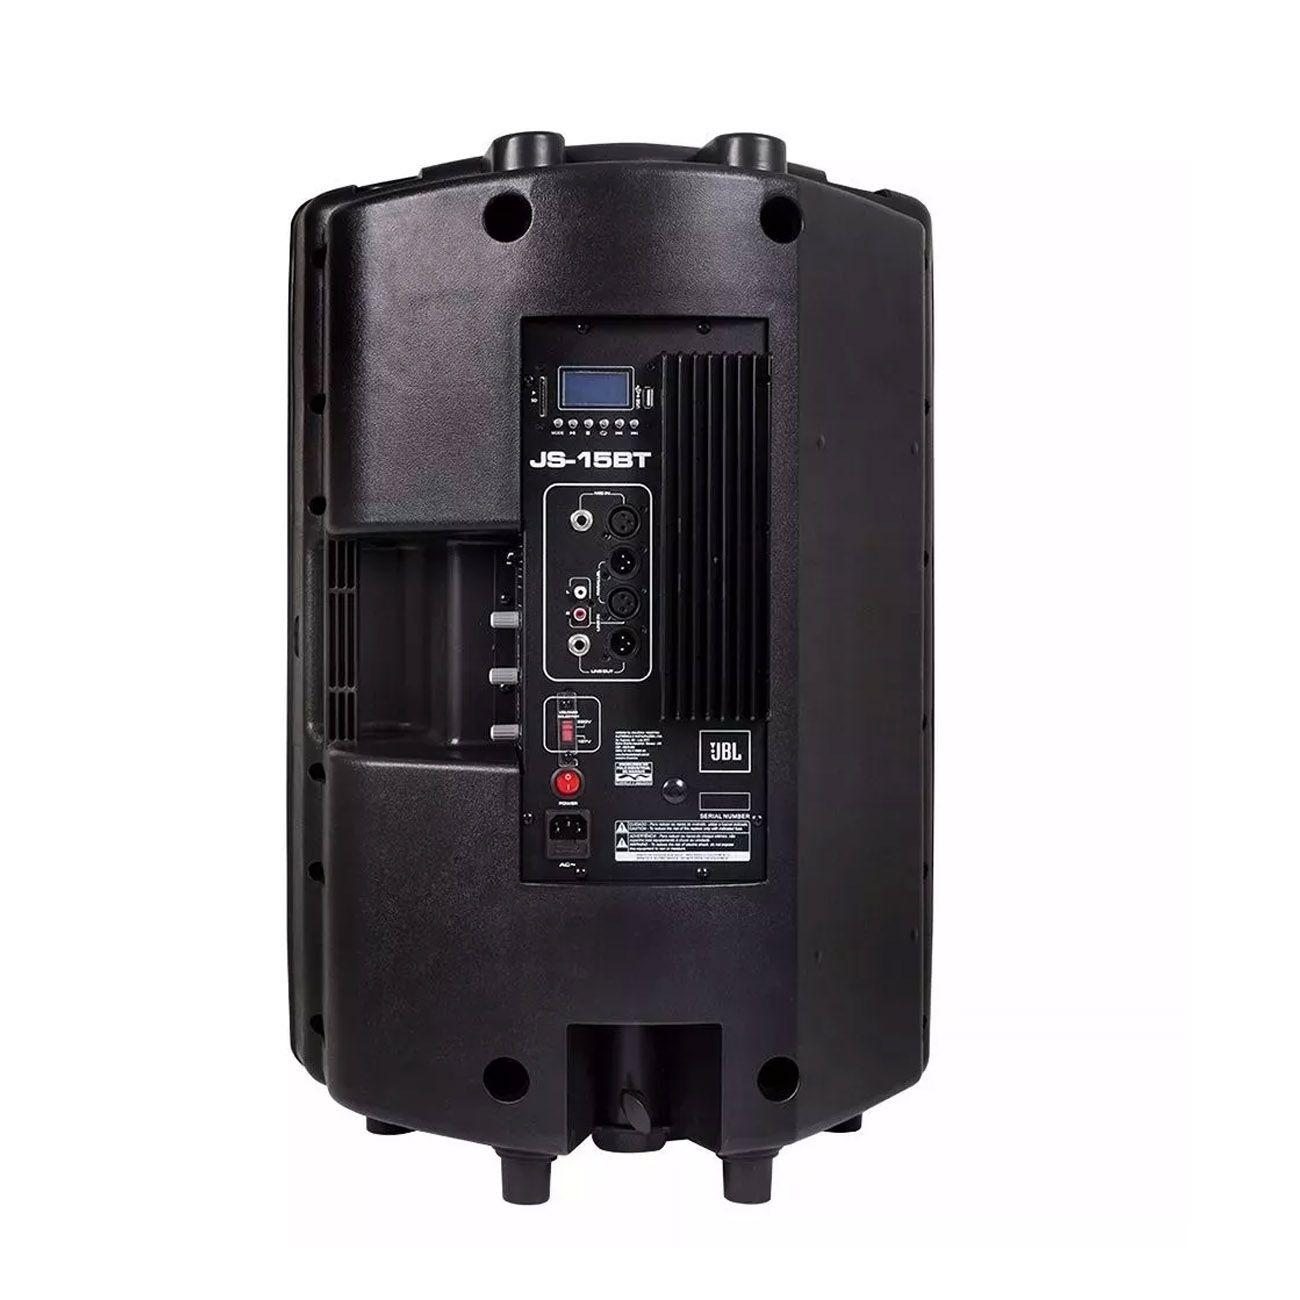 Caixa Acustica Ativa Jbl Js-15 Bt 15 Polegadas 200w Rms Usb / Sd/ Bluetooth / Folder